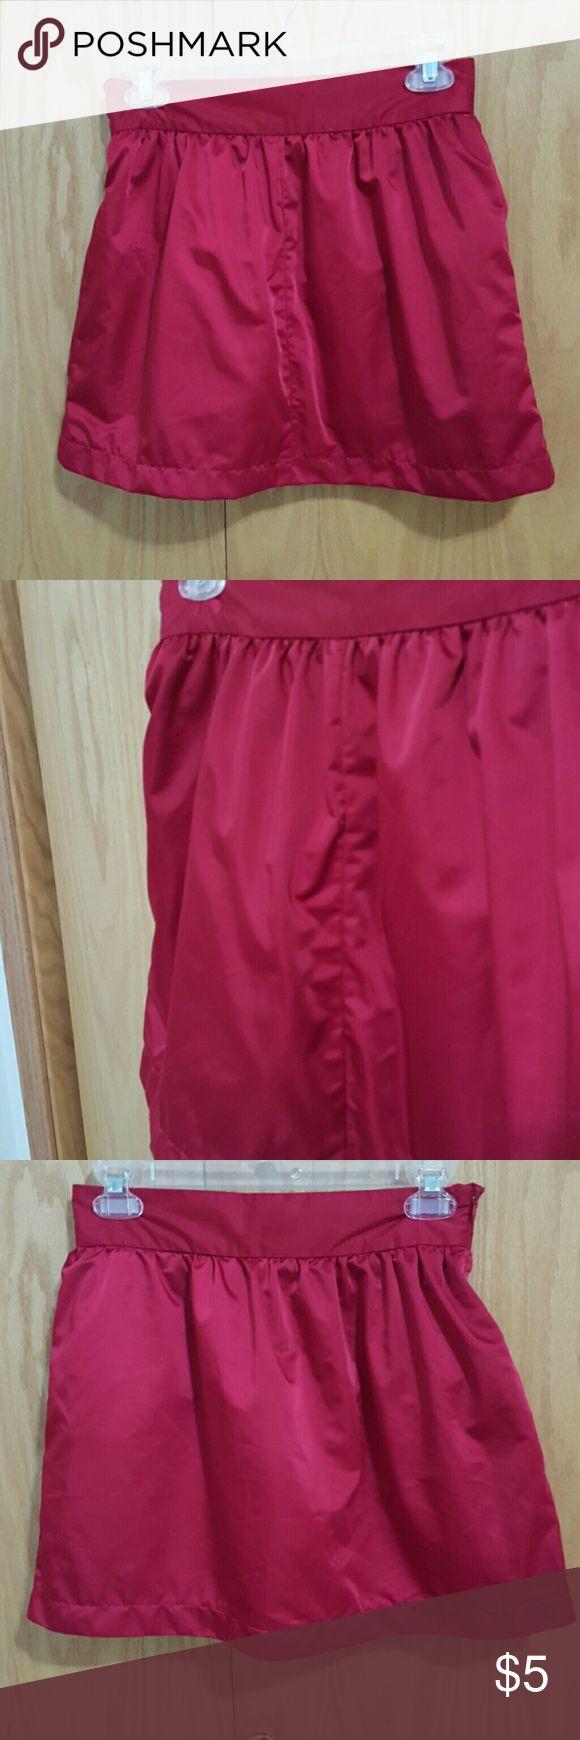 Red Silk Mini Skirt 142 Lined on the inside.  Price negotiable Forever 21 Skirts Mini